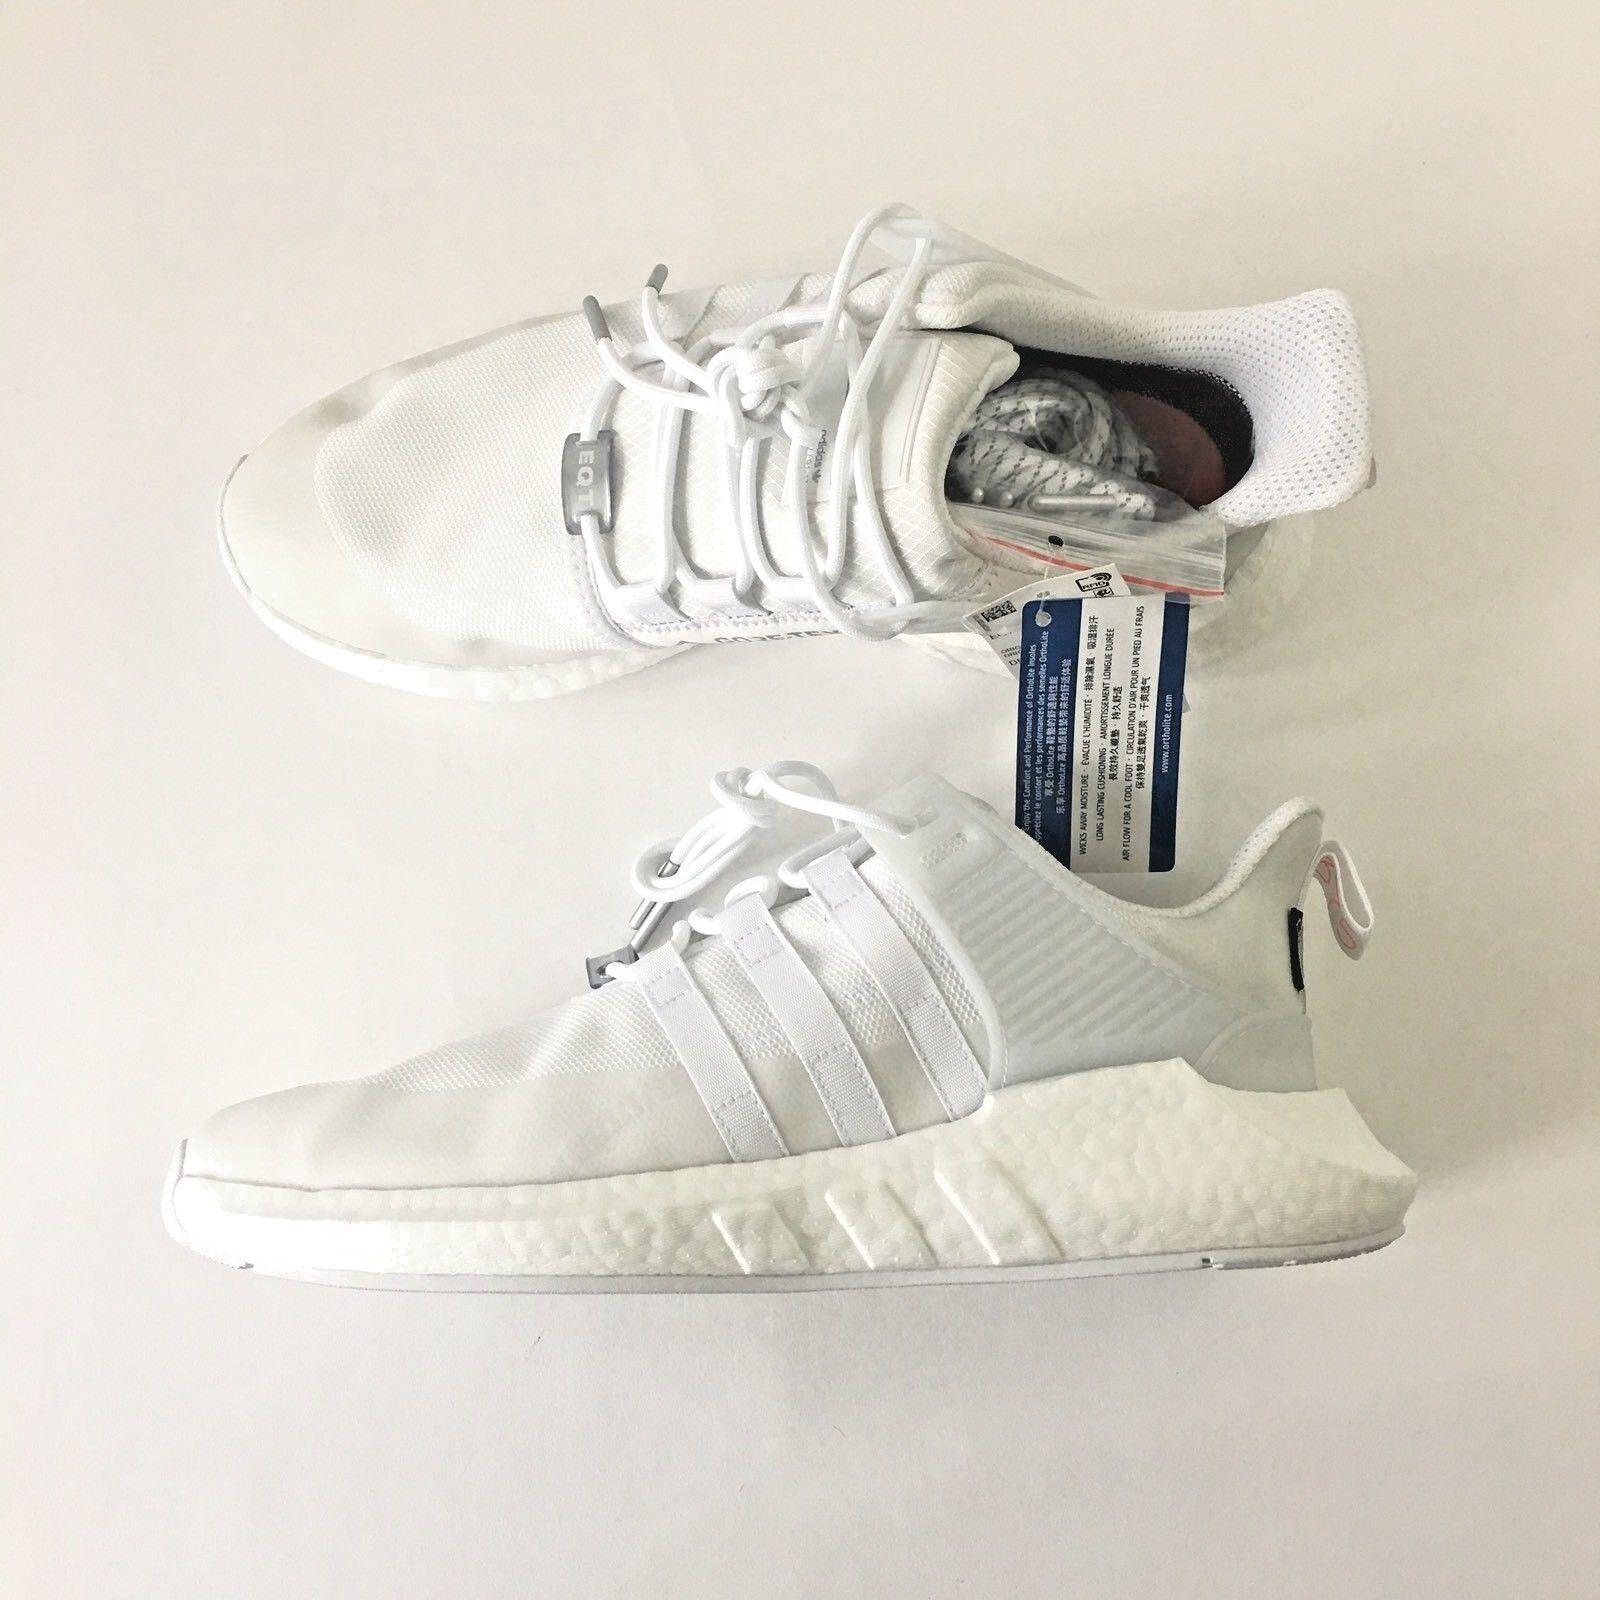 Adidas eqt unterstützung 93 / 17 steigern, Turnschuhe gore - tex - Turnschuhe steigern, schuhe weiße db1444 mens größe 10. 21881e